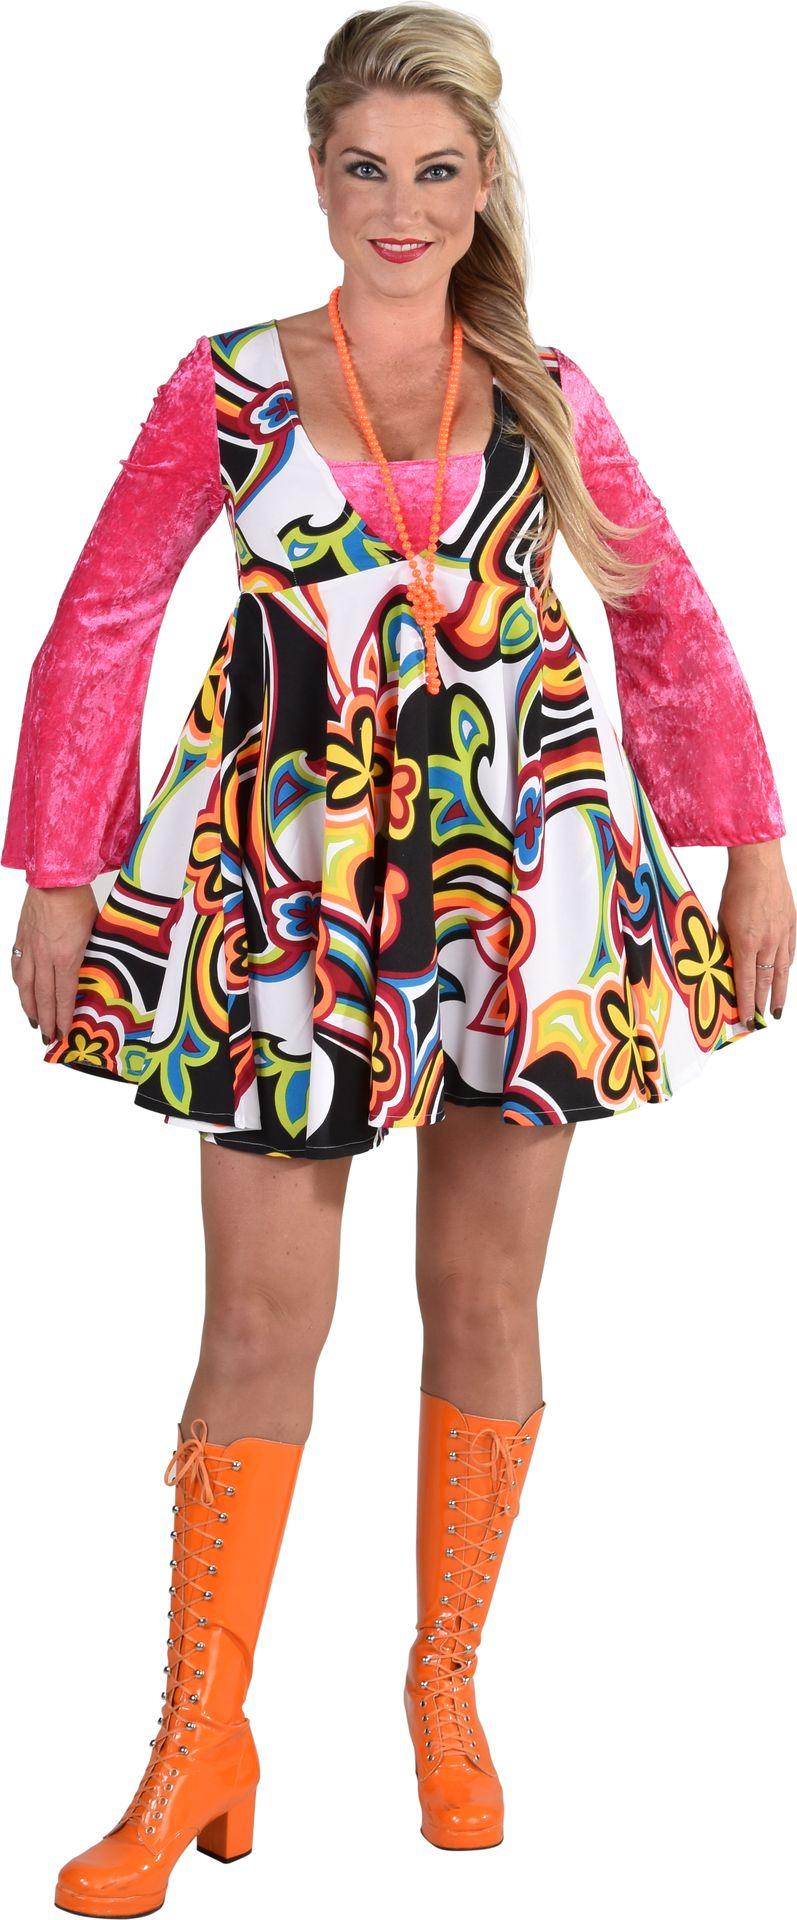 70s jurkje fantasie vrouwen